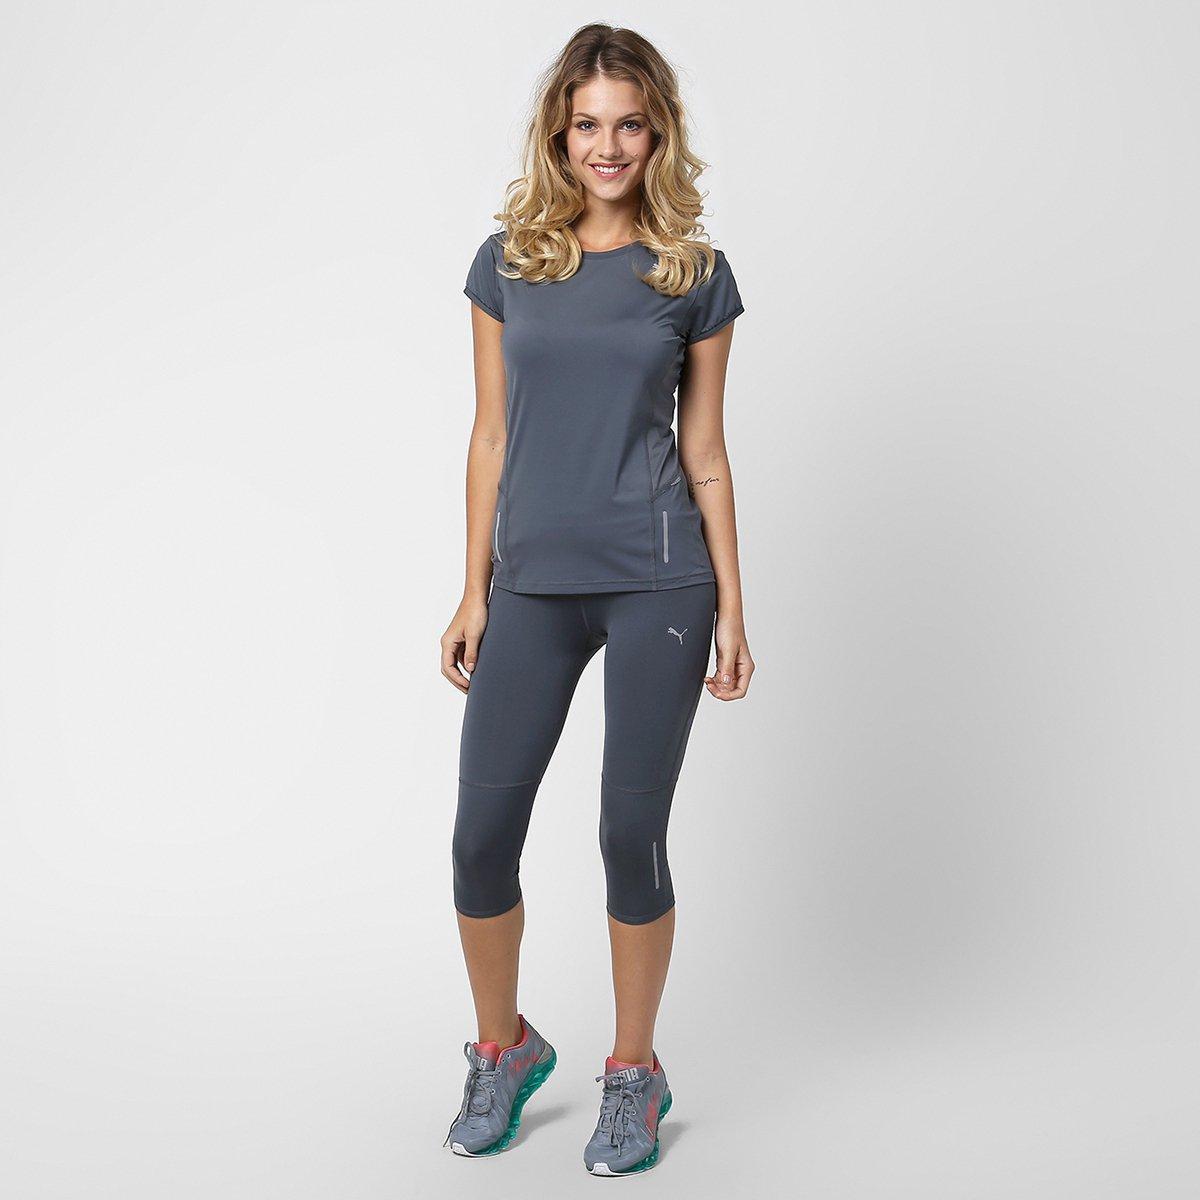 Camiseta Puma Pure Fitted - Compre Agora  829c4588f549d